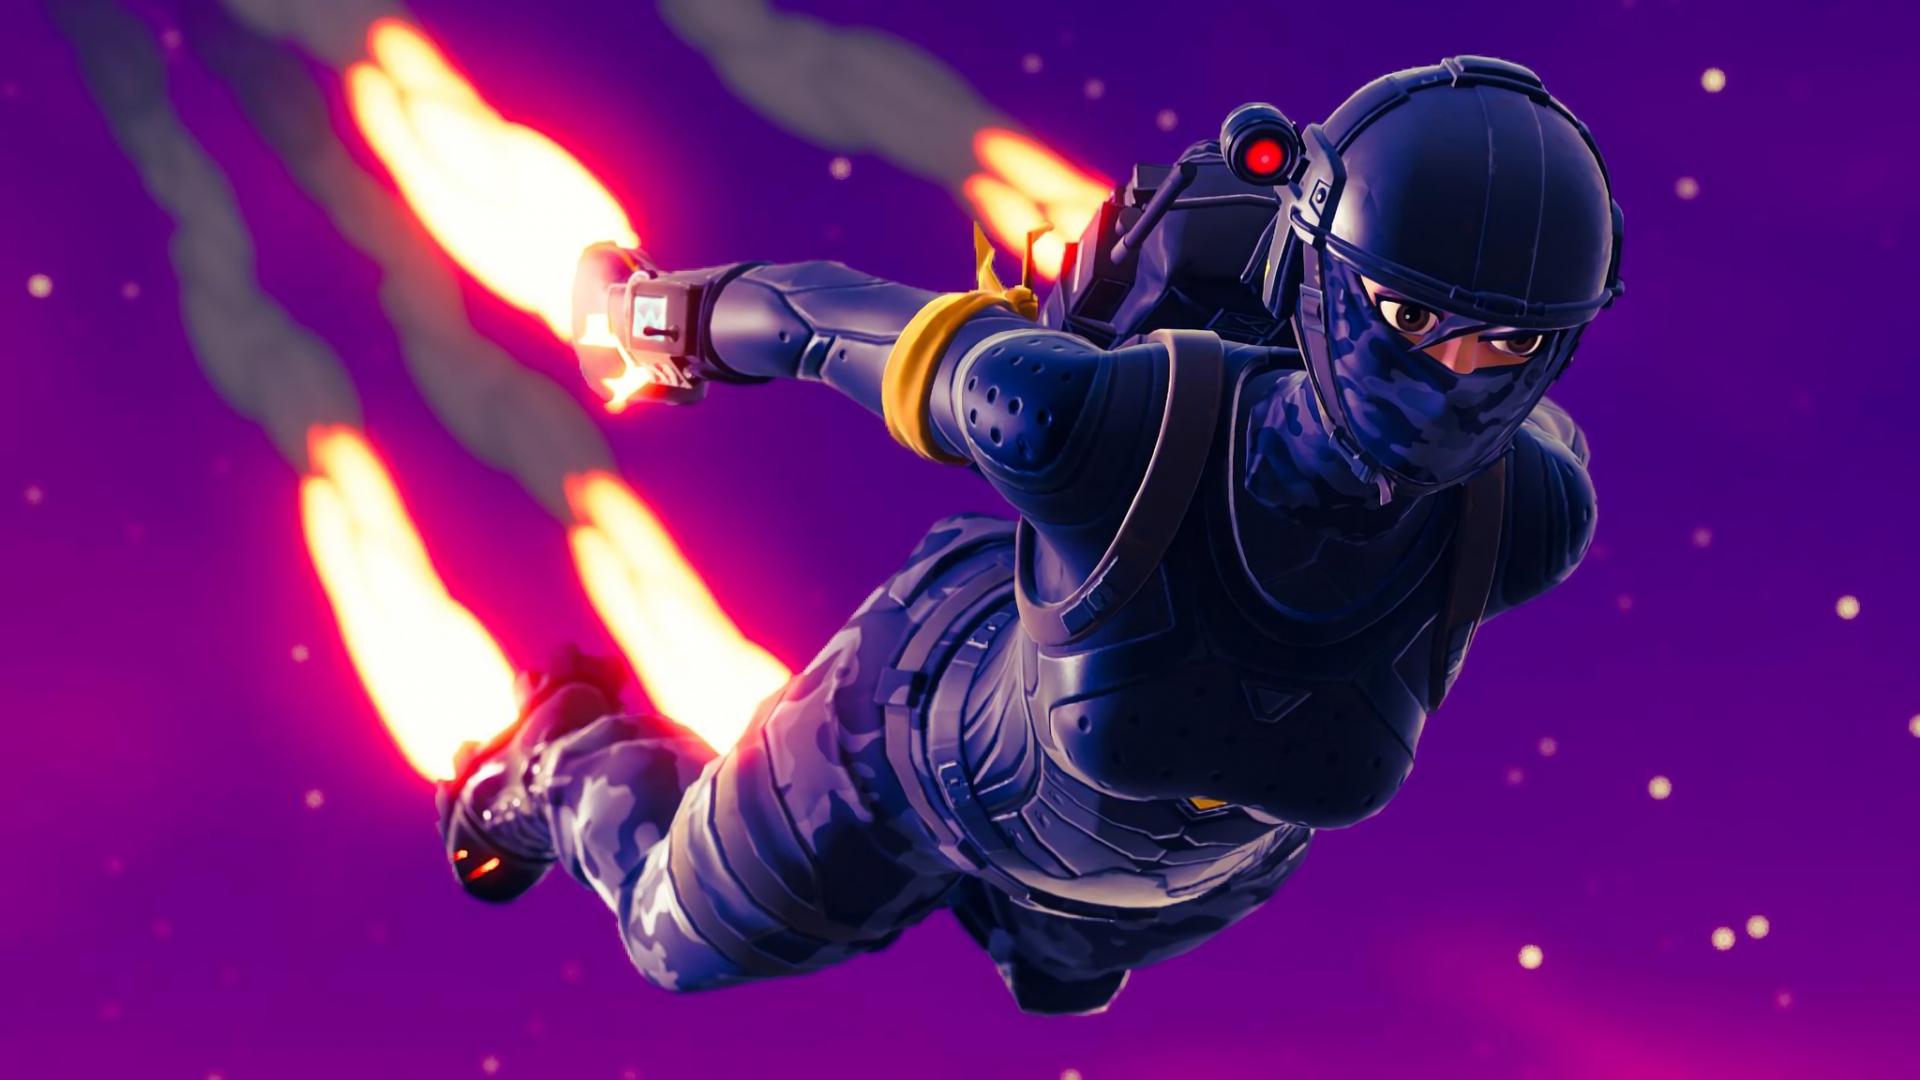 Free Download 2048x1152 Elite Agent Skydive Fortnite Battle